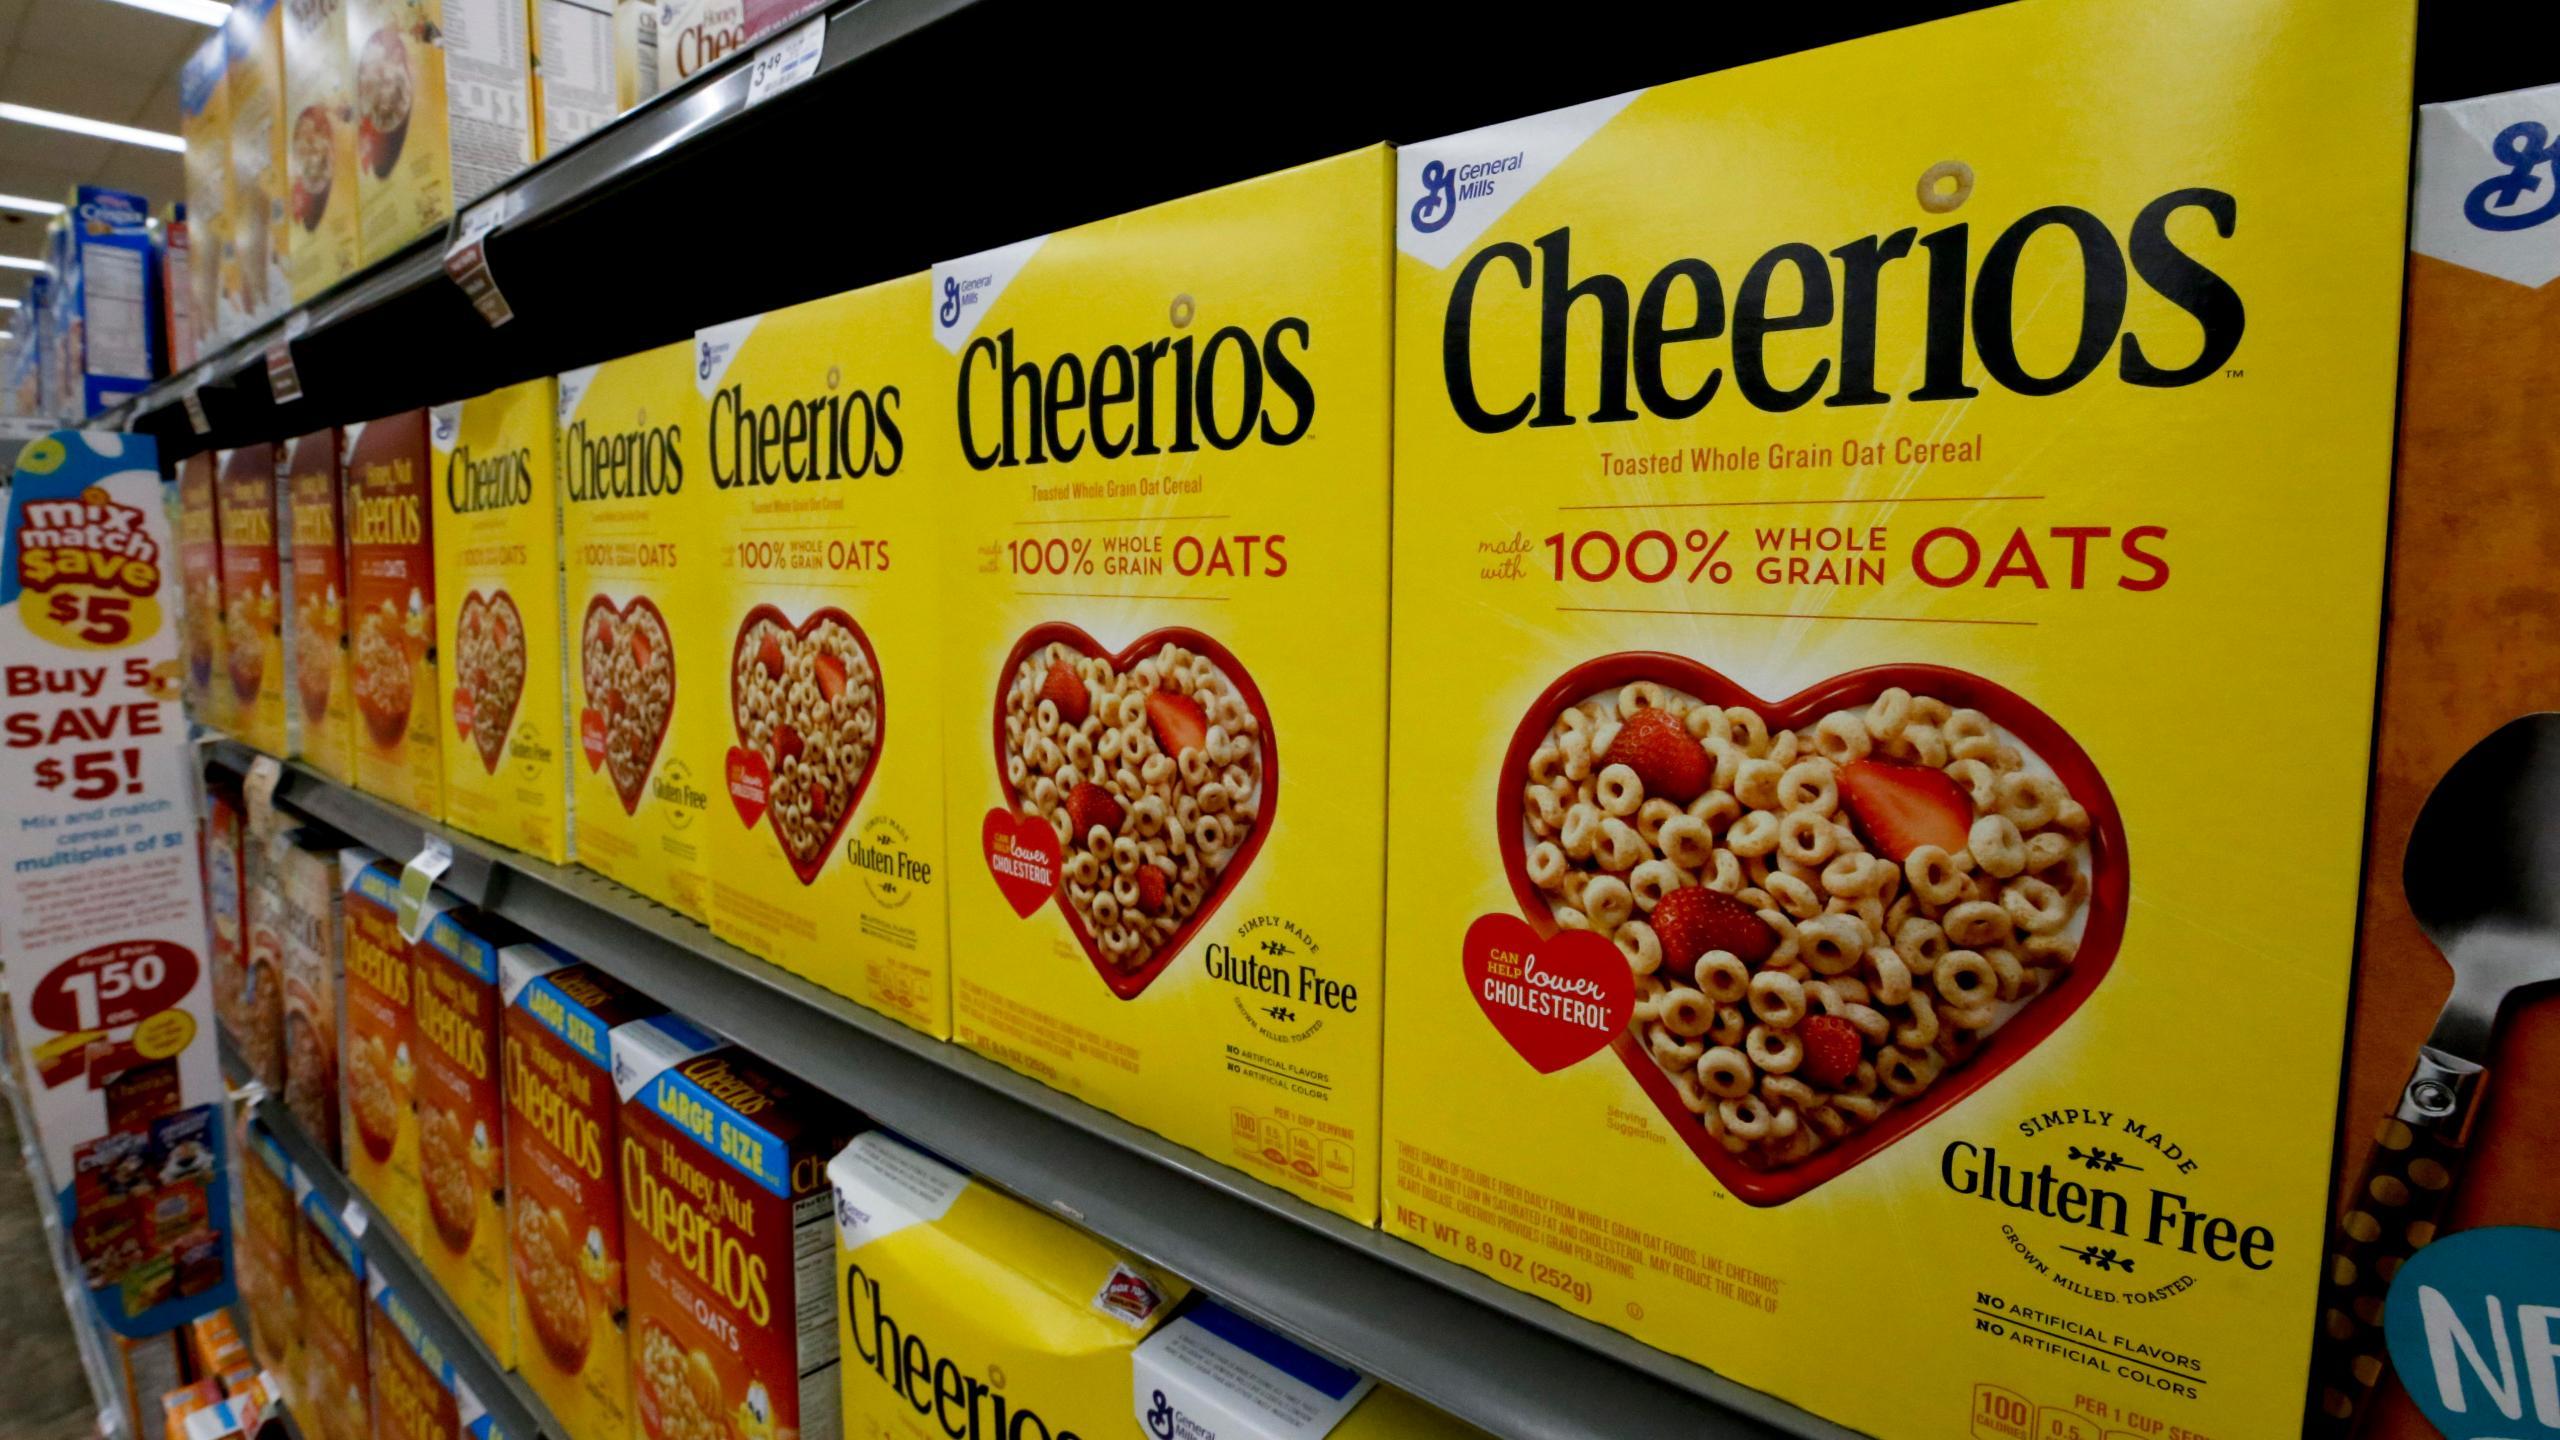 General Mills Cheerios Cereal_1560364175894